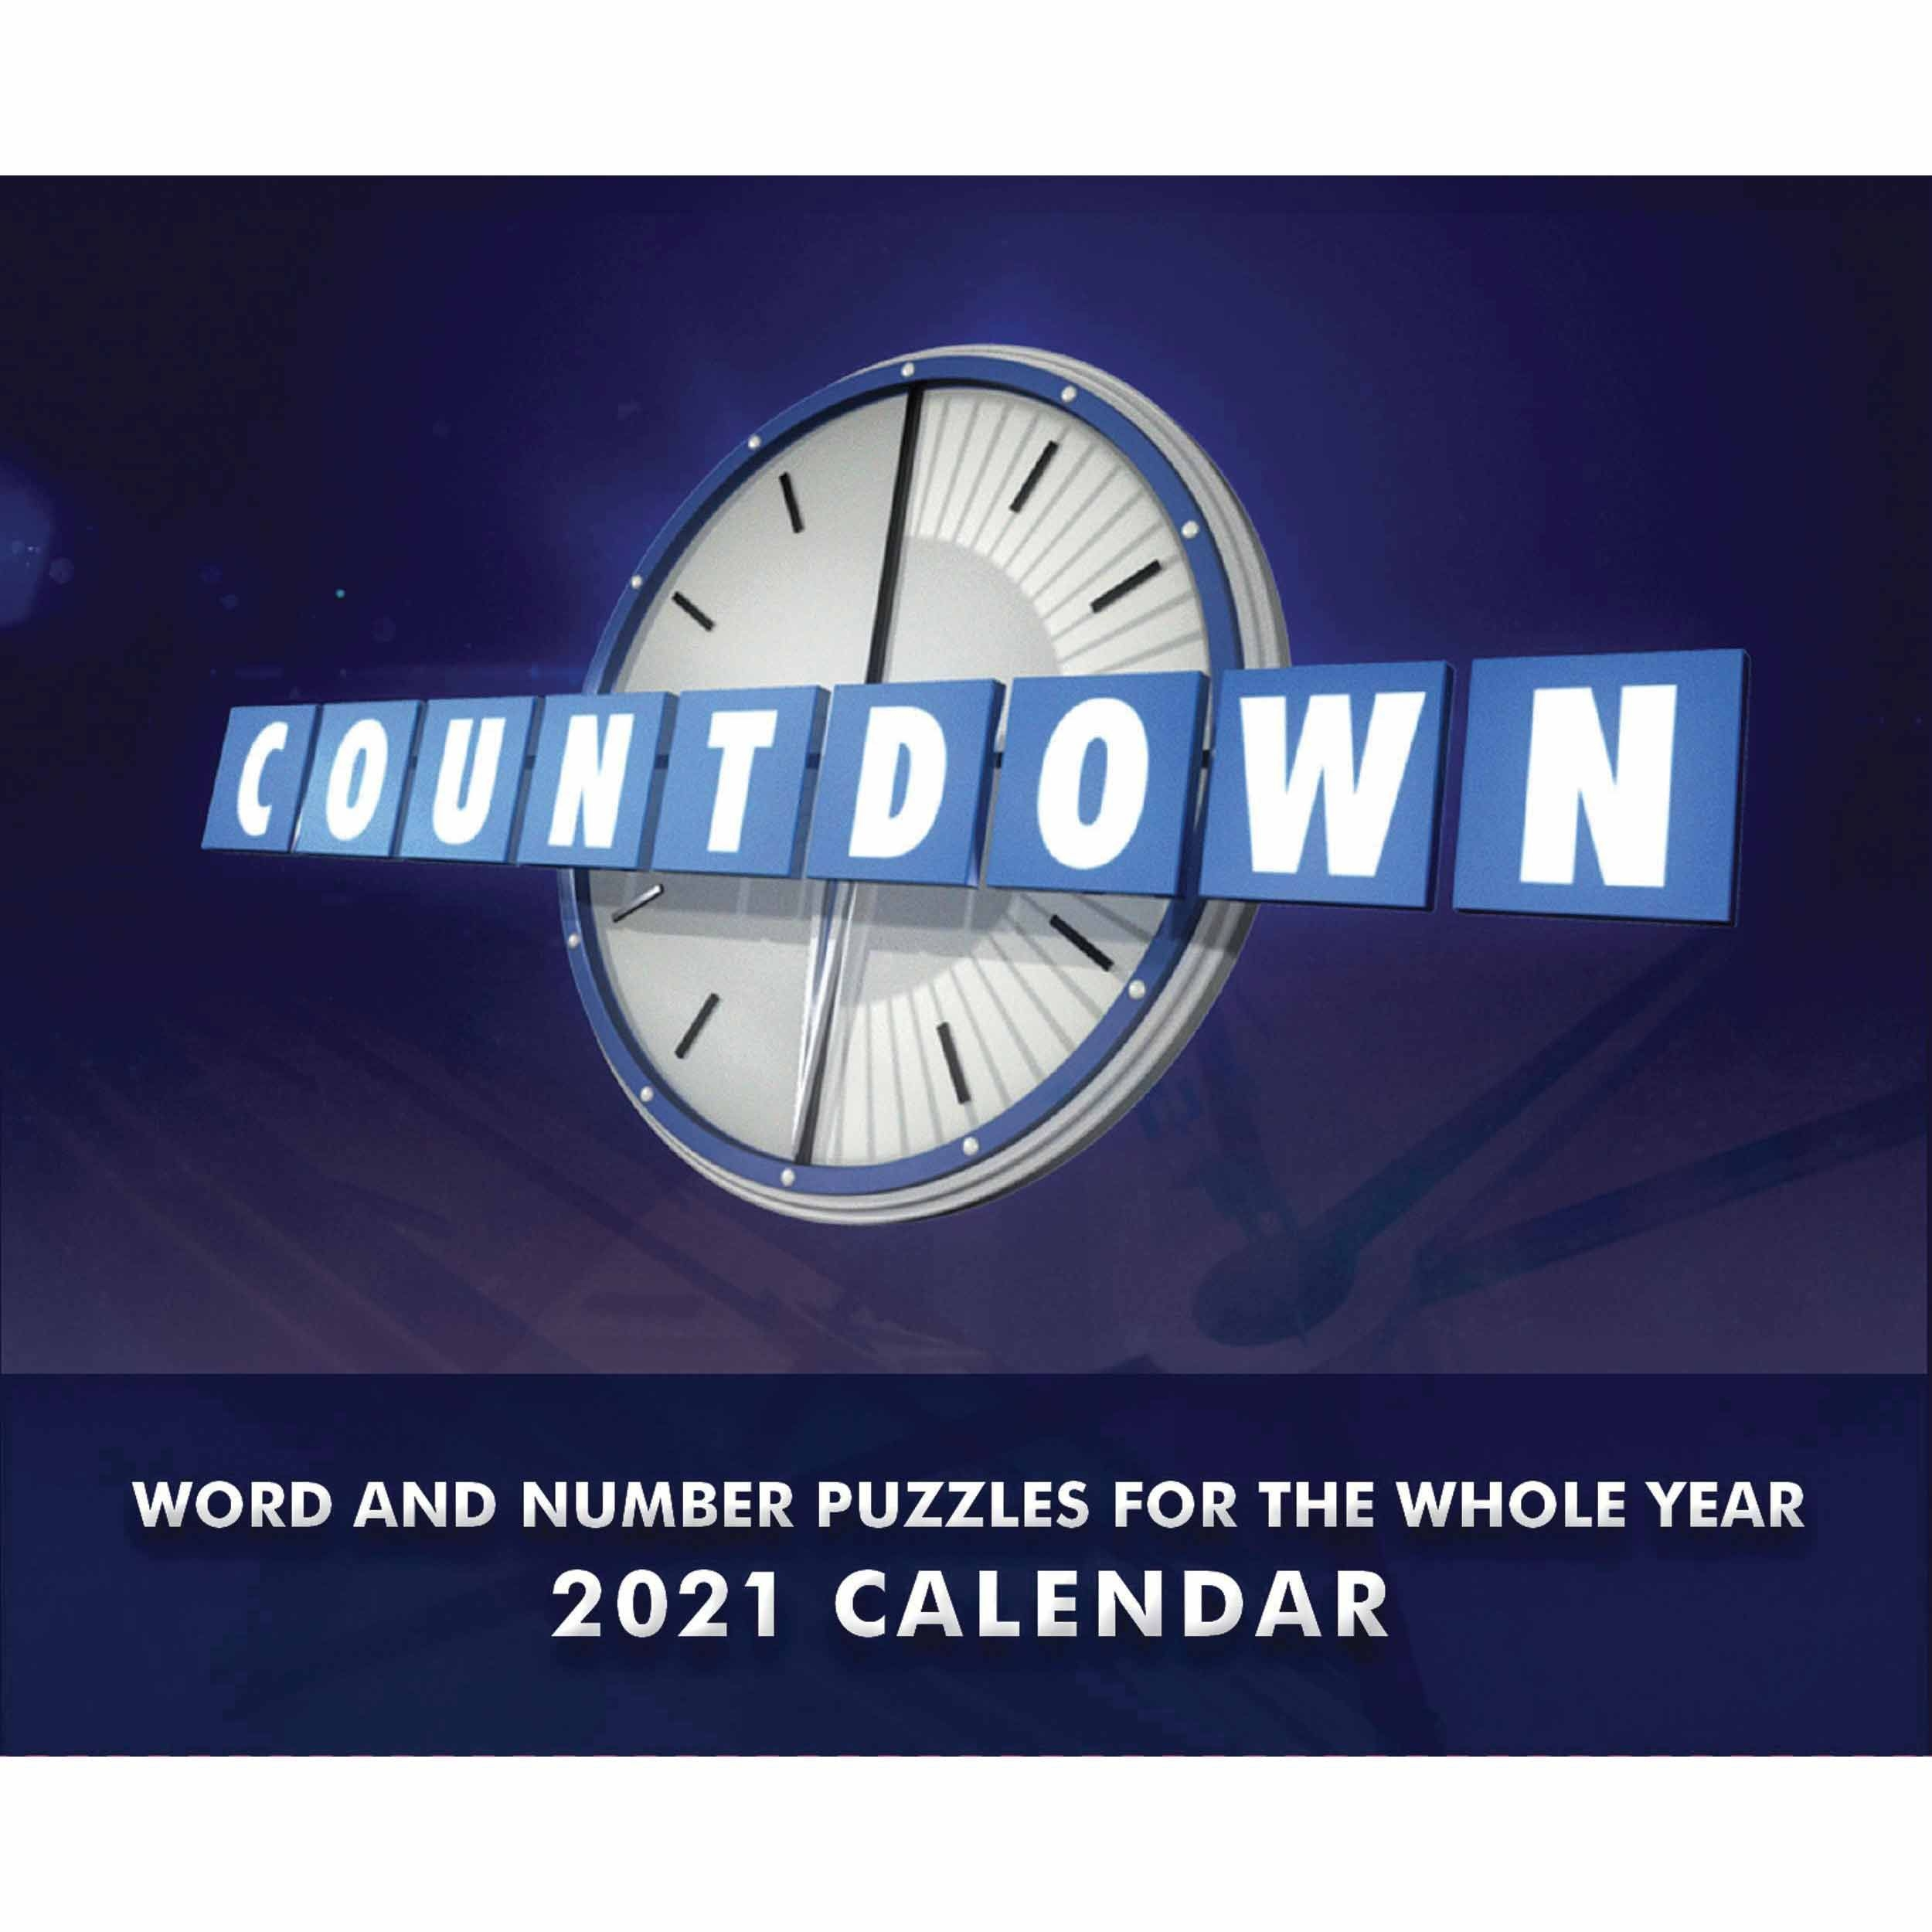 Countdown Desk Calendar 2021 At Calendar Club